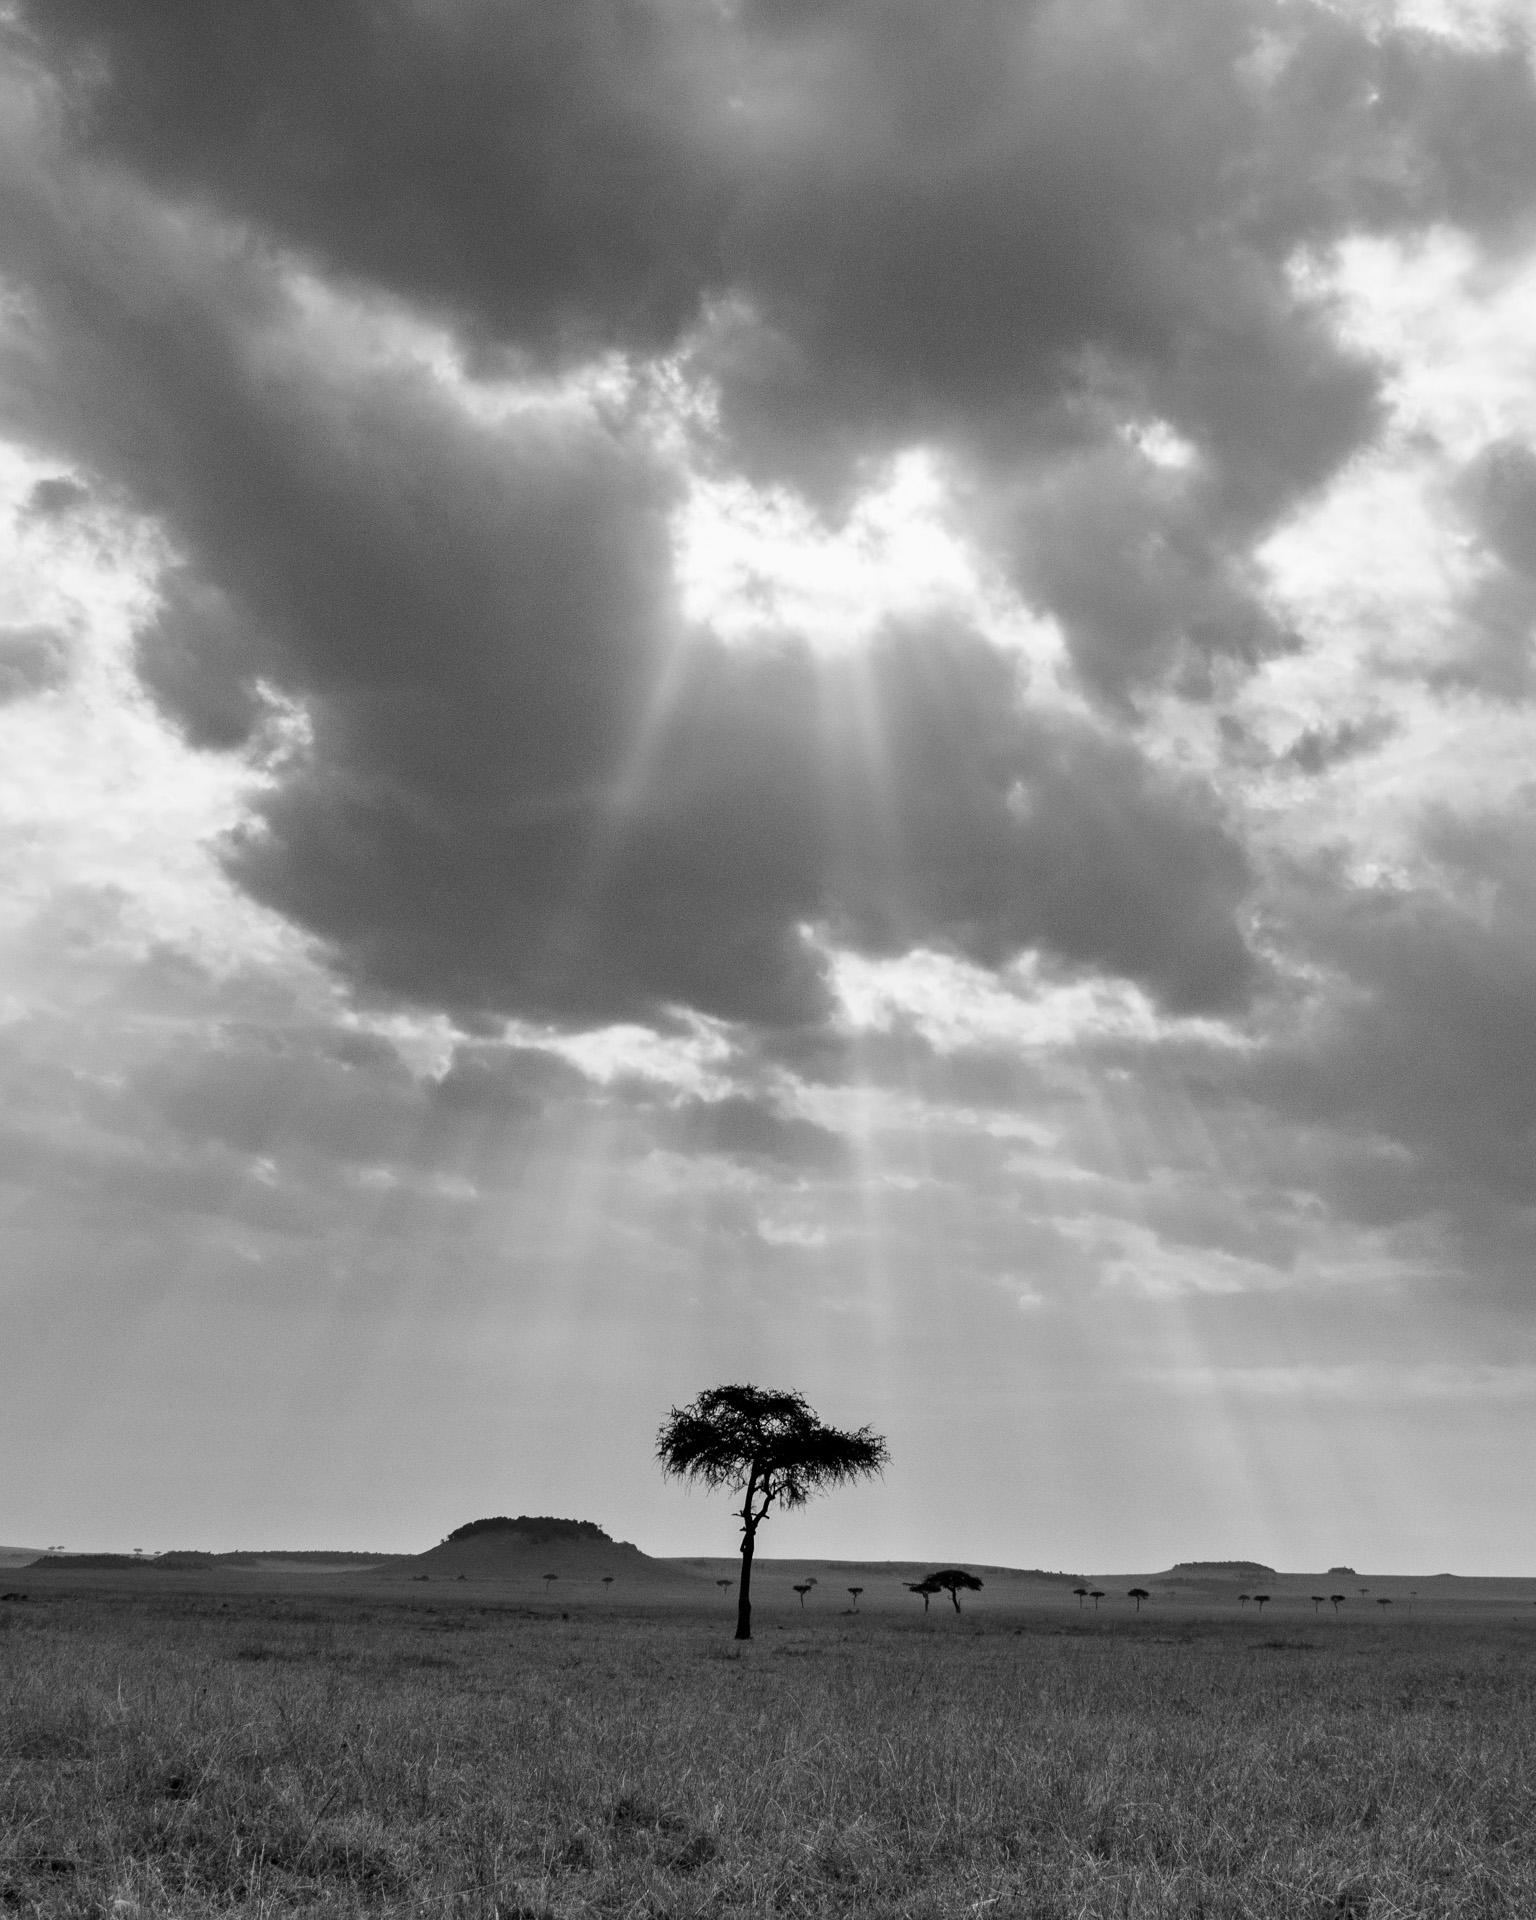 Single tree and sky